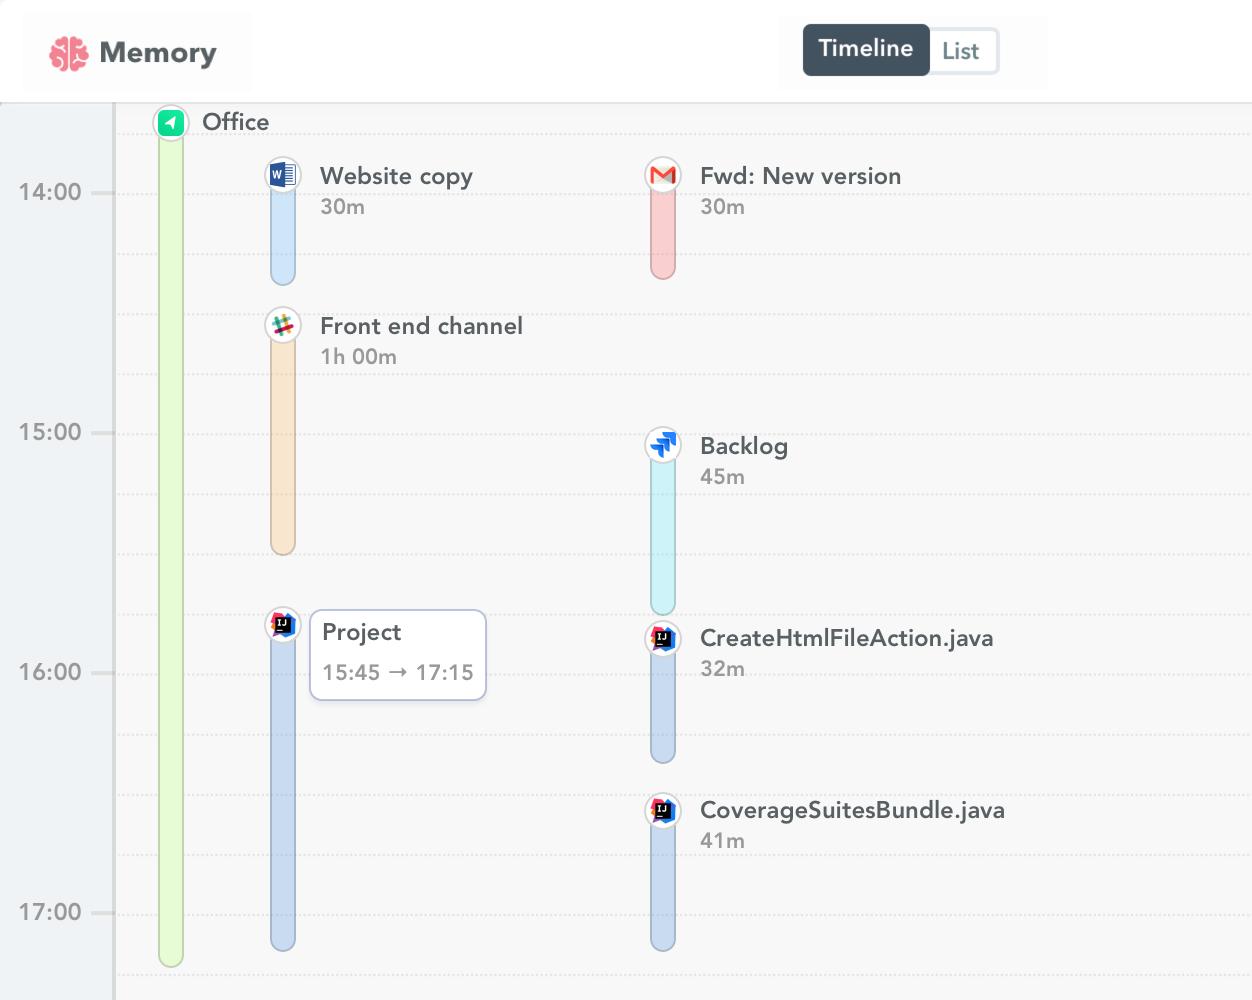 IntelliJ IDEA time tracking